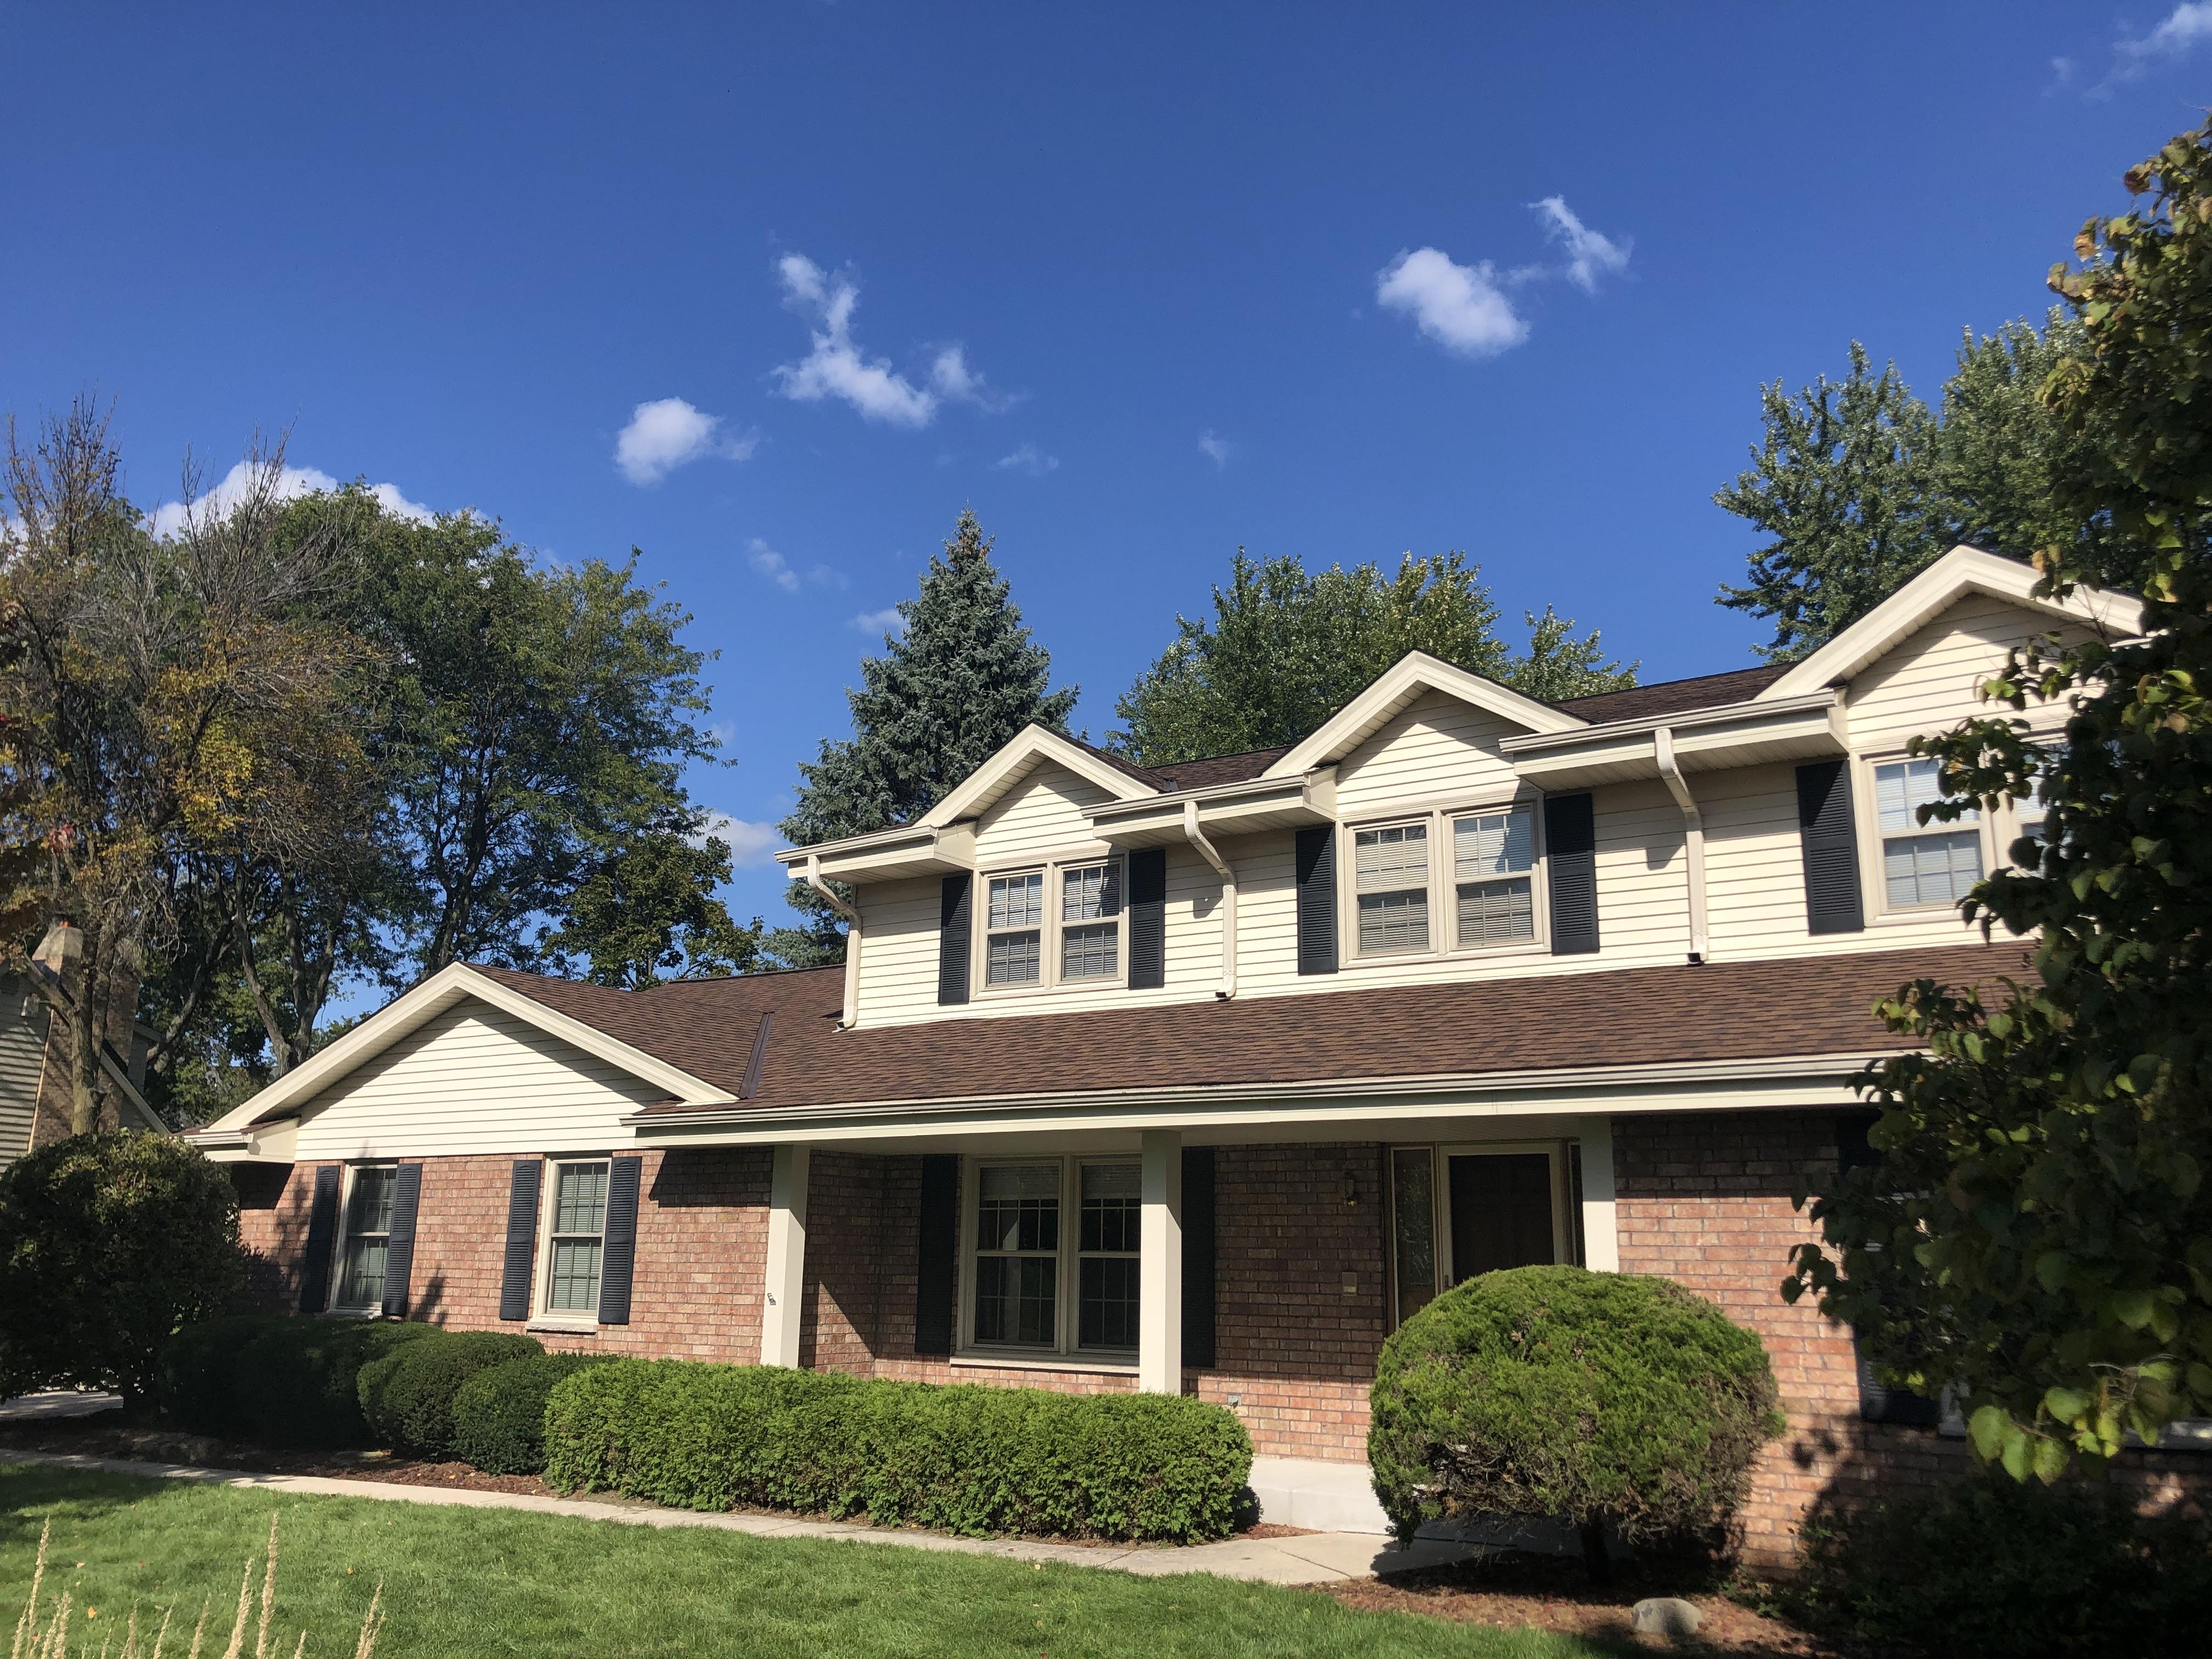 Wisconsin Roofing LLC | Brookfield | Upgraded Ventilation Unblocked Soffit Vents | Baffled Intake Chutes | CertainTeed Landmark Burnt Sienna Shingles | Side